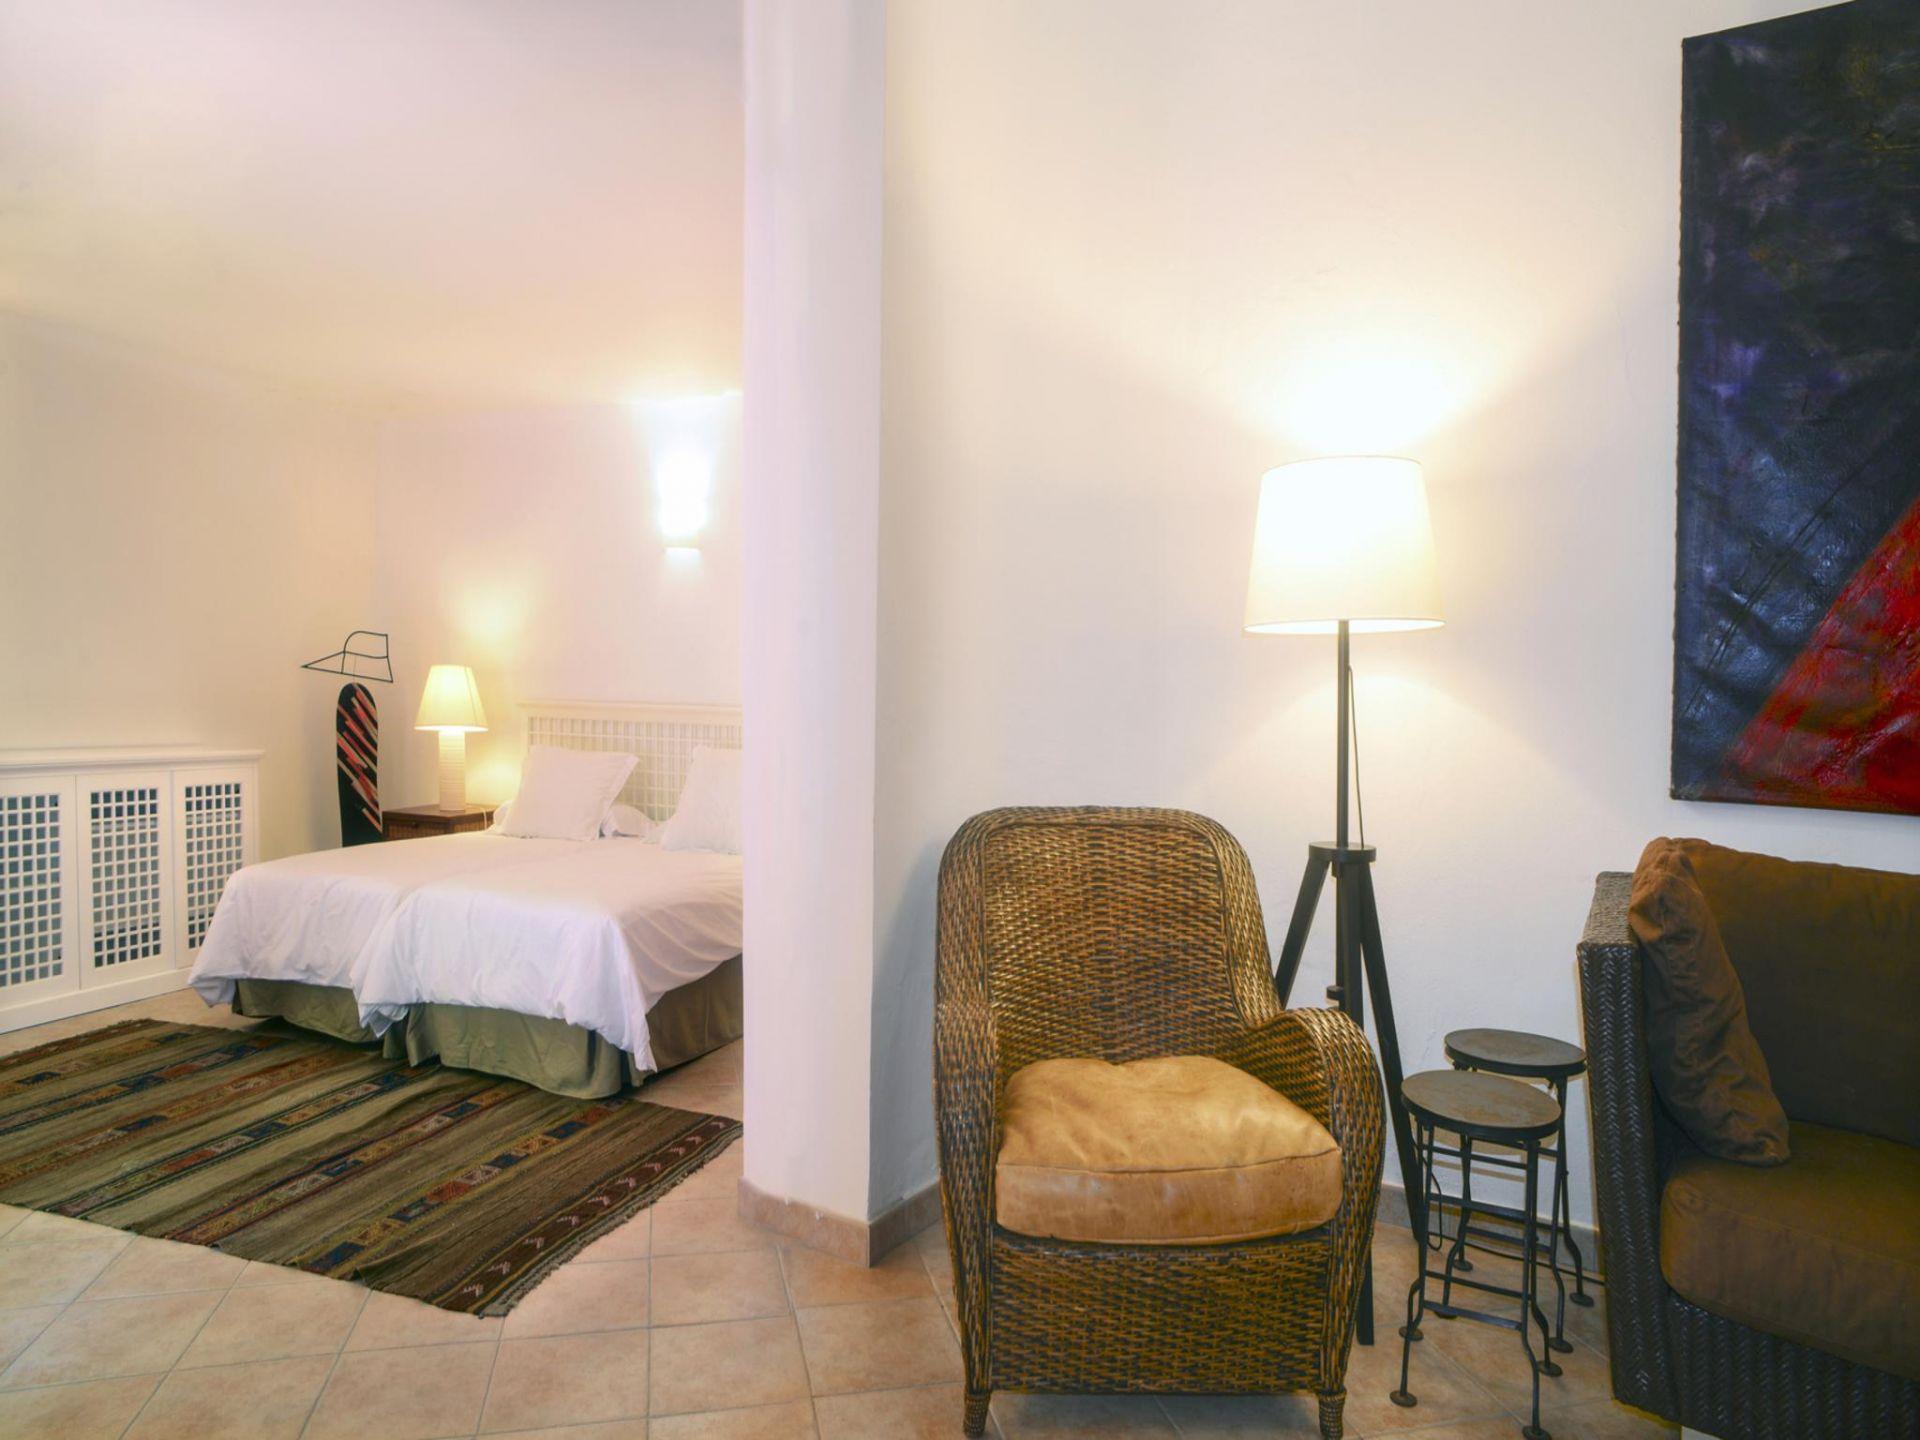 Holiday apartment Villa San Agustin 10 - Holiday Rental (854295), Maspalomas, Gran Canaria, Canary Islands, Spain, picture 27